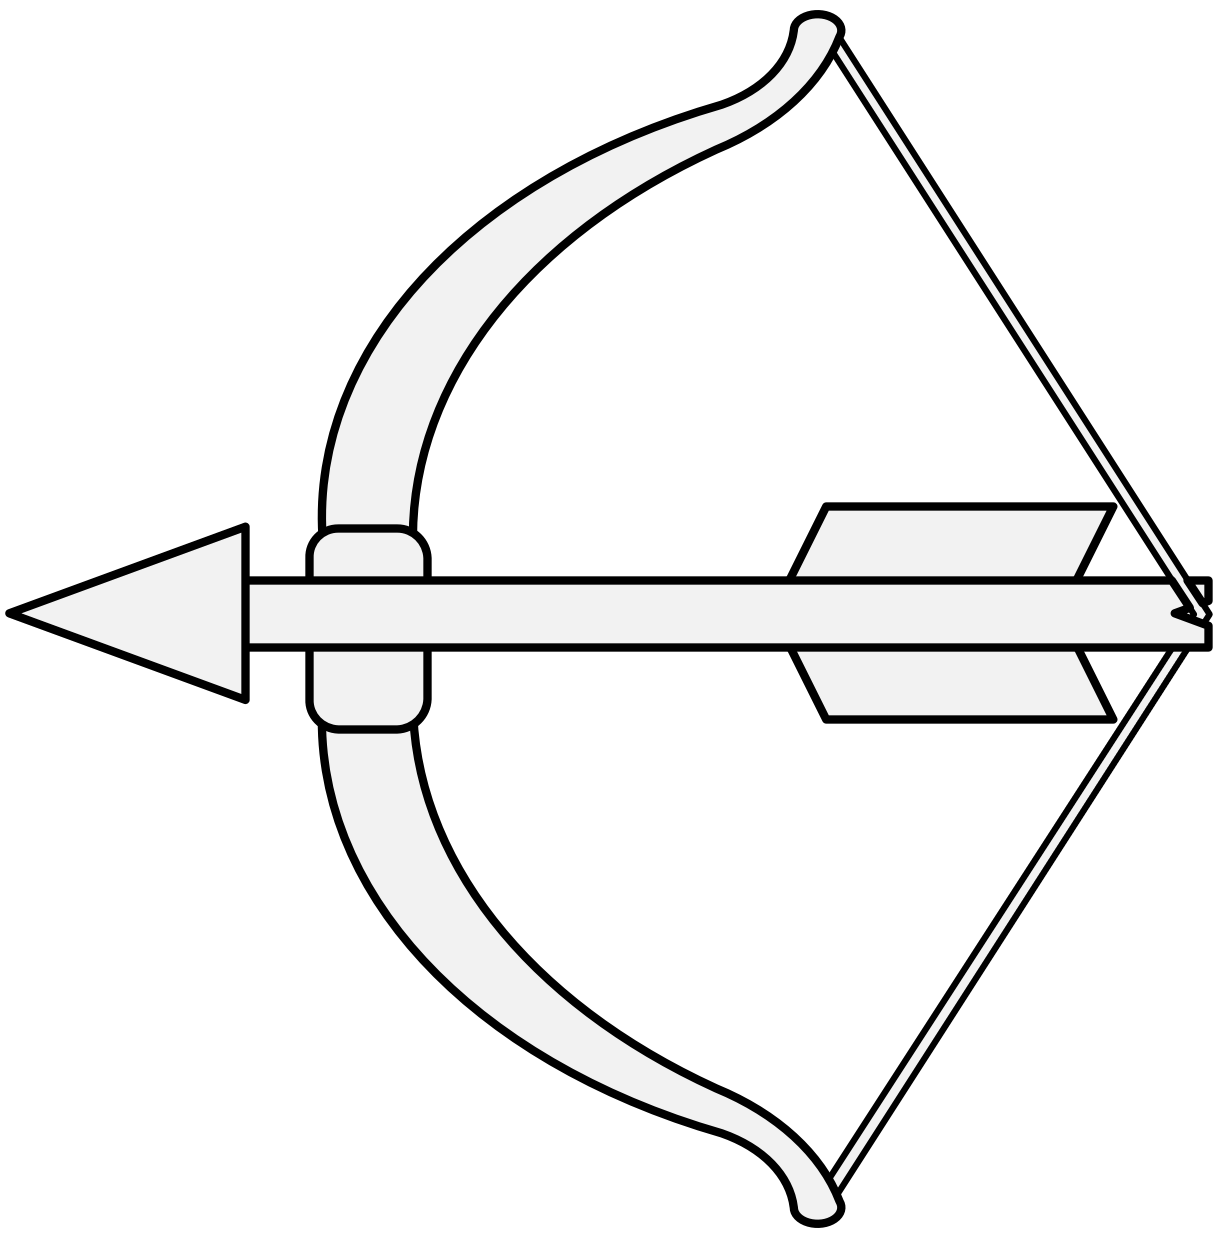 image free stock Bow arrow at getdrawings. Drawing snake skin